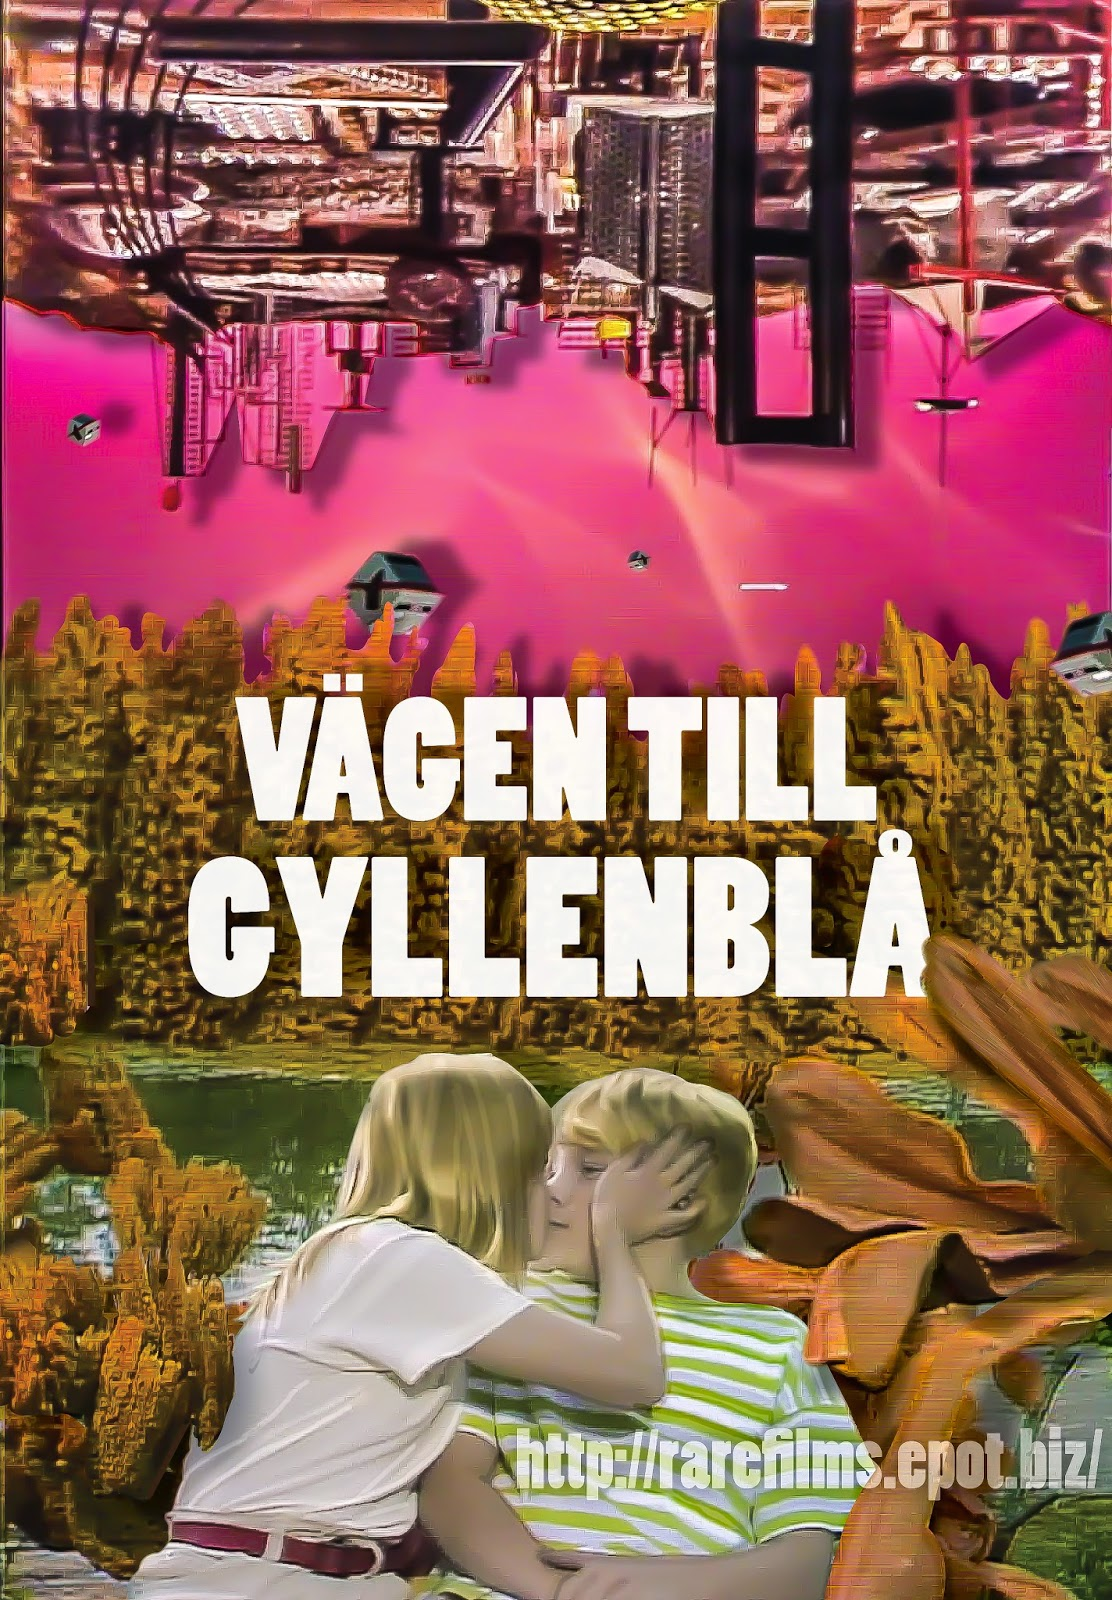 Путешествие на Gyllenblå / Vägen till Gyllenblå! 1985.